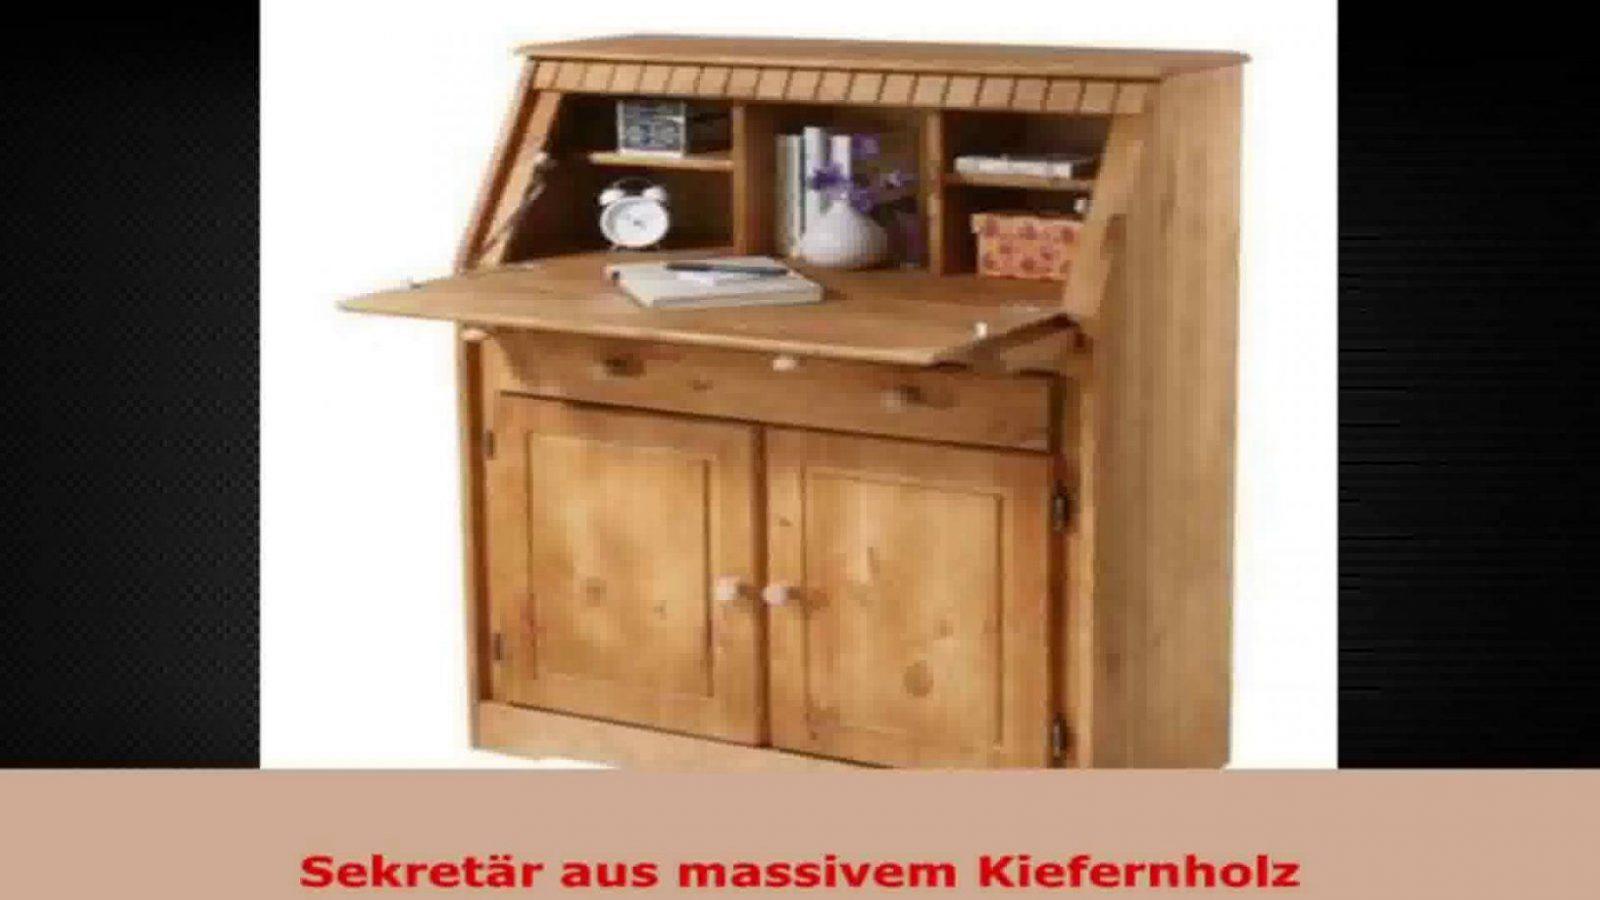 Sekretär Aus Massiver Kiefer Gelaugtgeölt Schreibtisch  Youtube von Sekretär Kiefer Gelaugt Geölt Bild